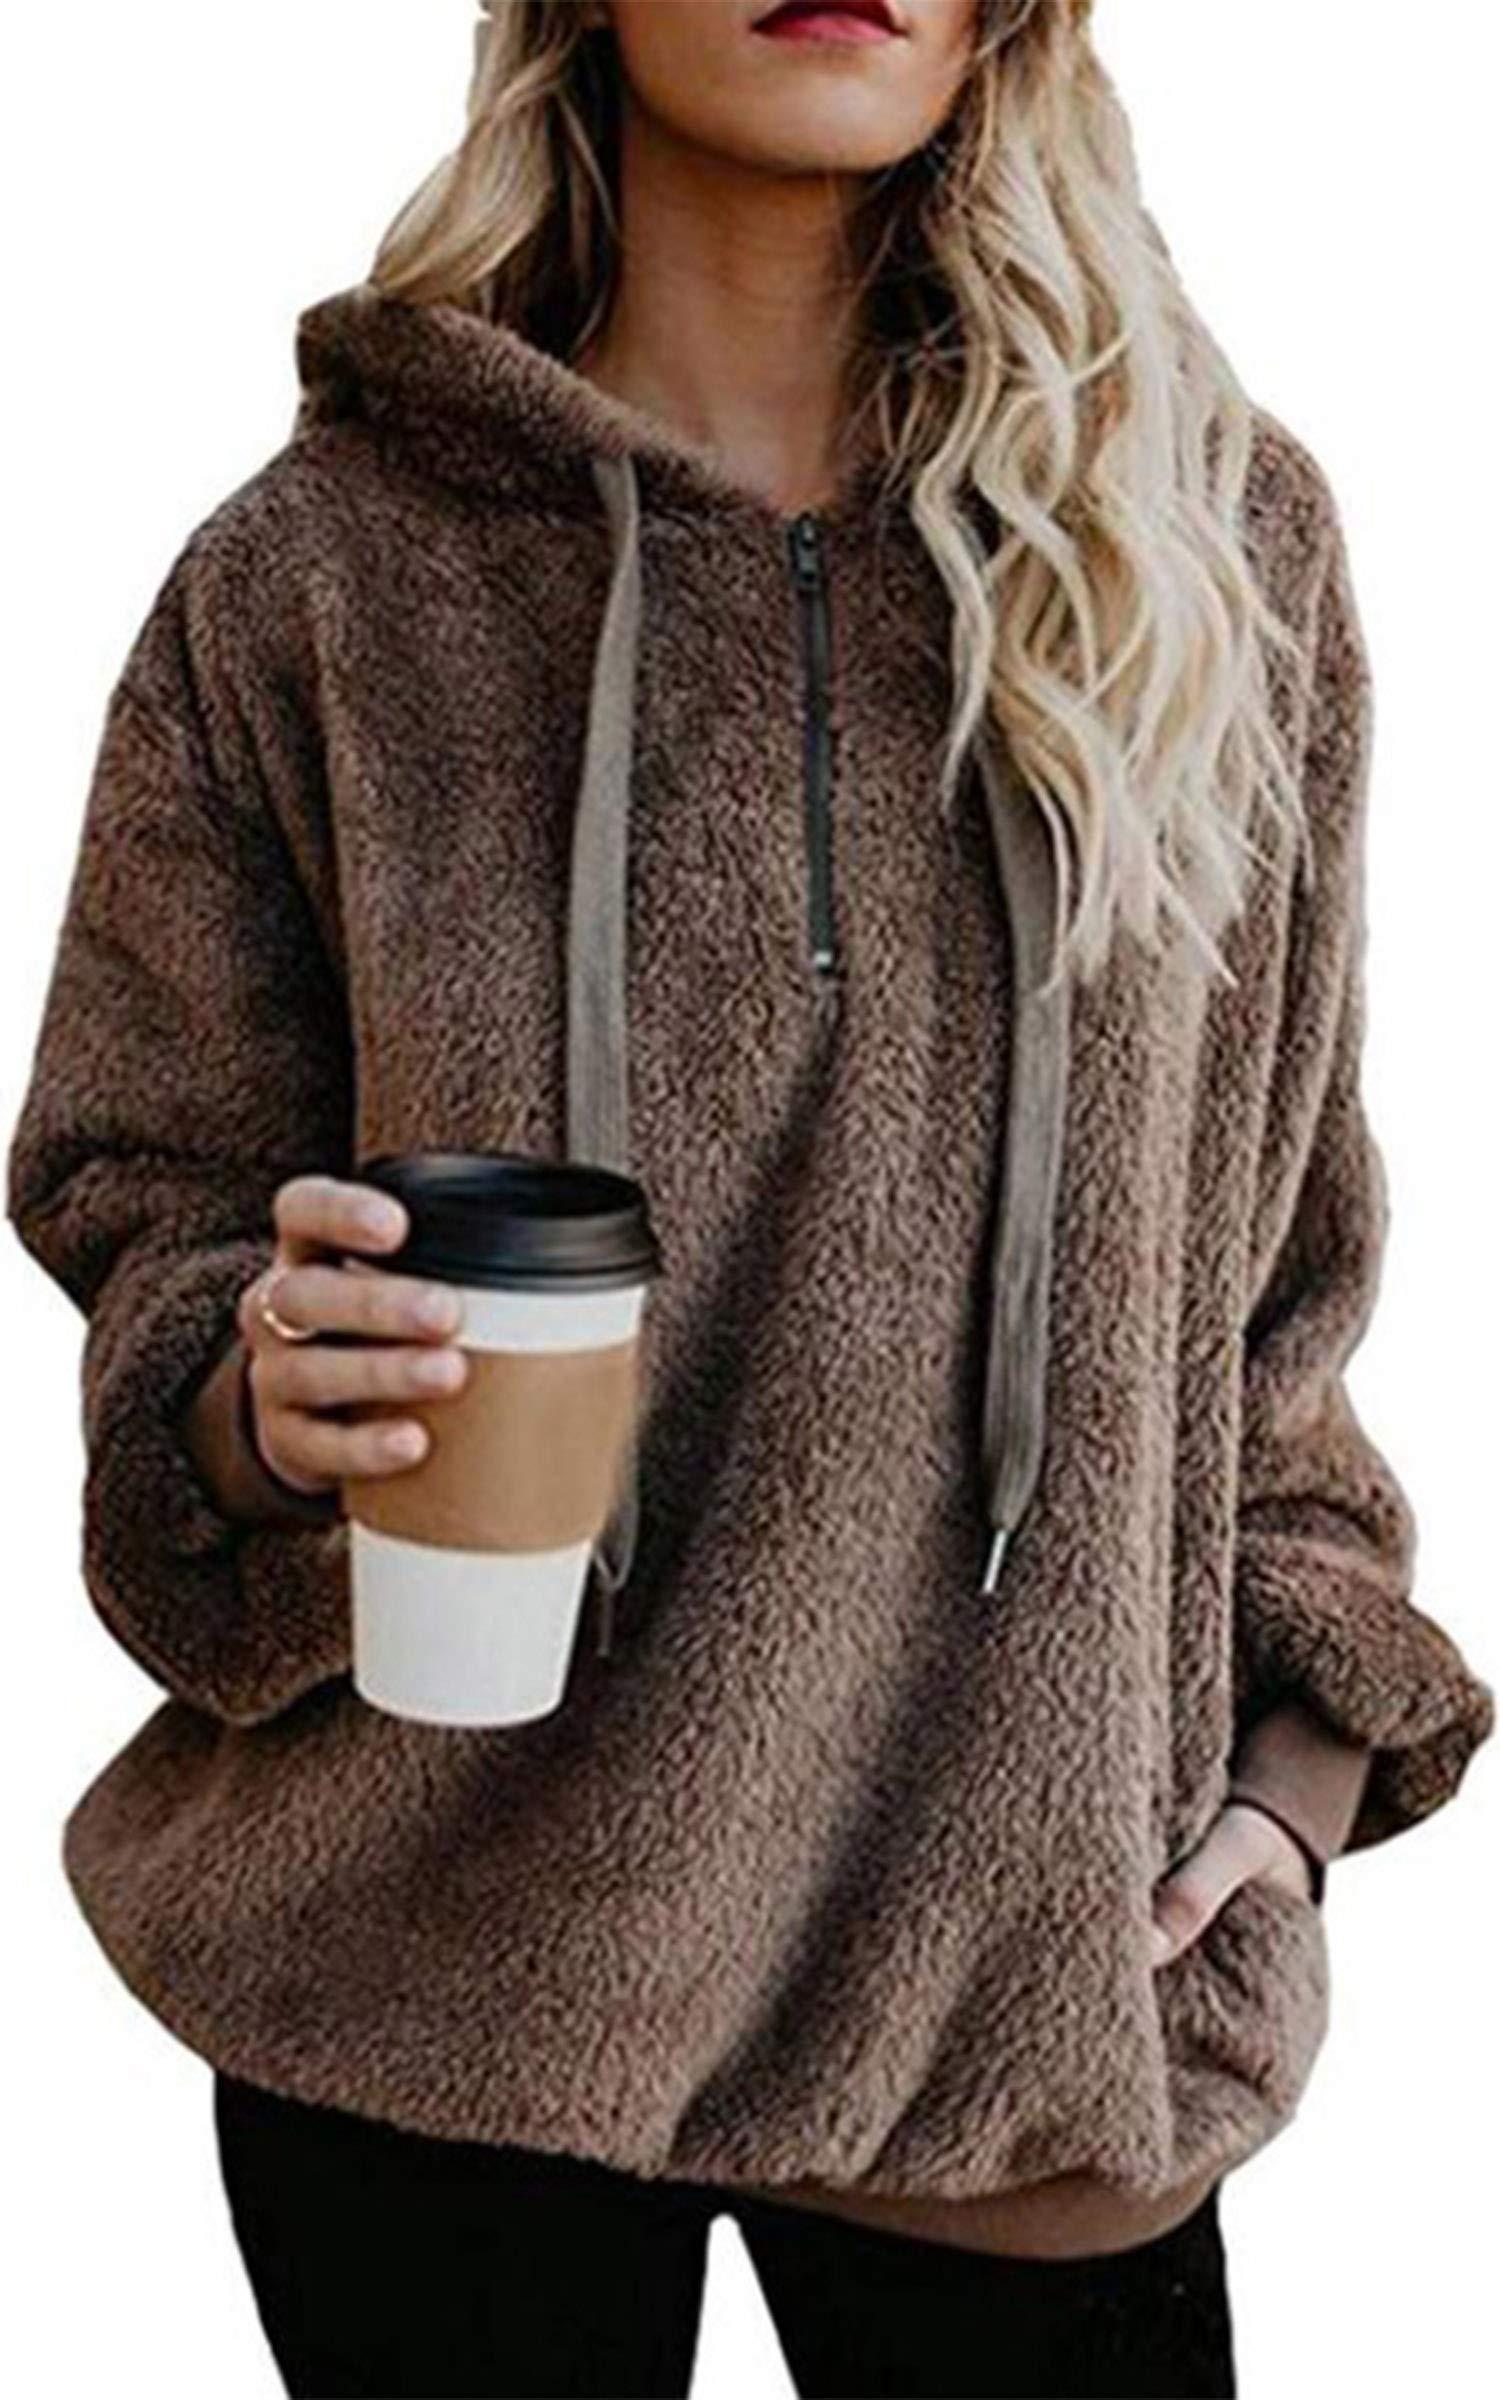 Angashion Womens Sweatshirt - Long Sleeve 1/4 Zip Up Faux Fleece Pullover Hoodies Coat Tops Outwear with Pocket 169 Khaki L